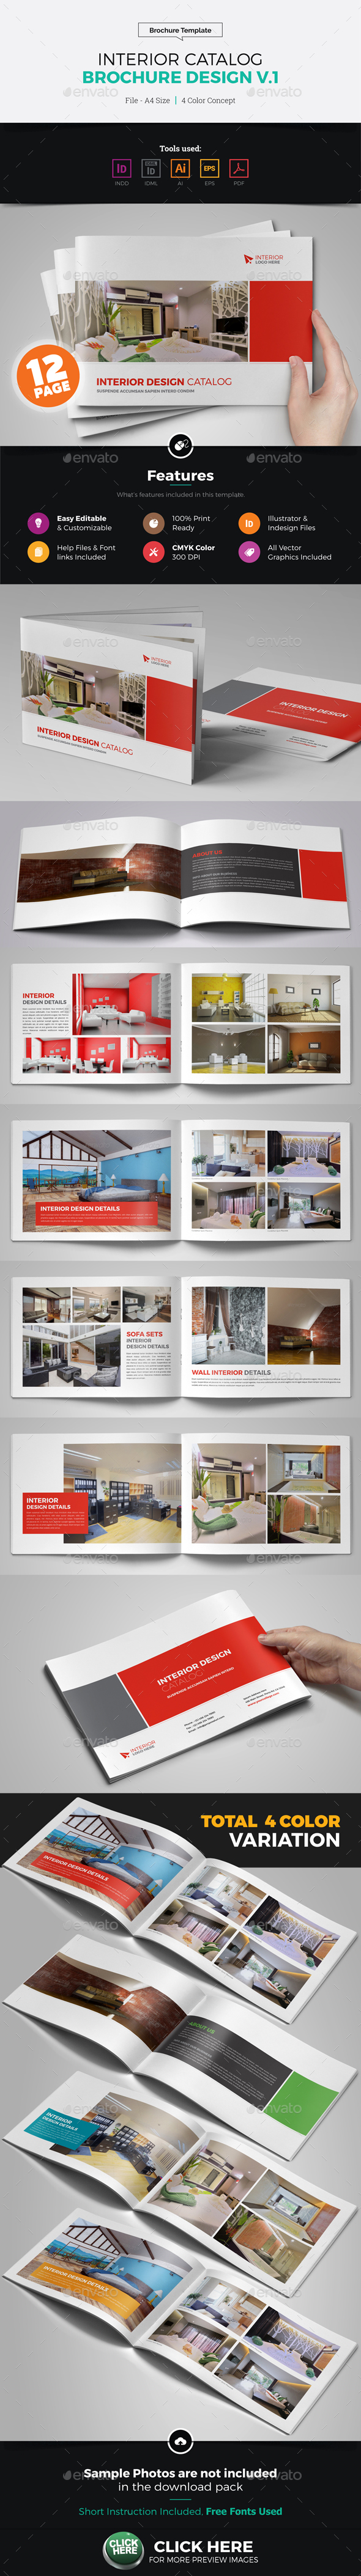 Interior Brochure Catalog Design v1 - Corporate Brochures